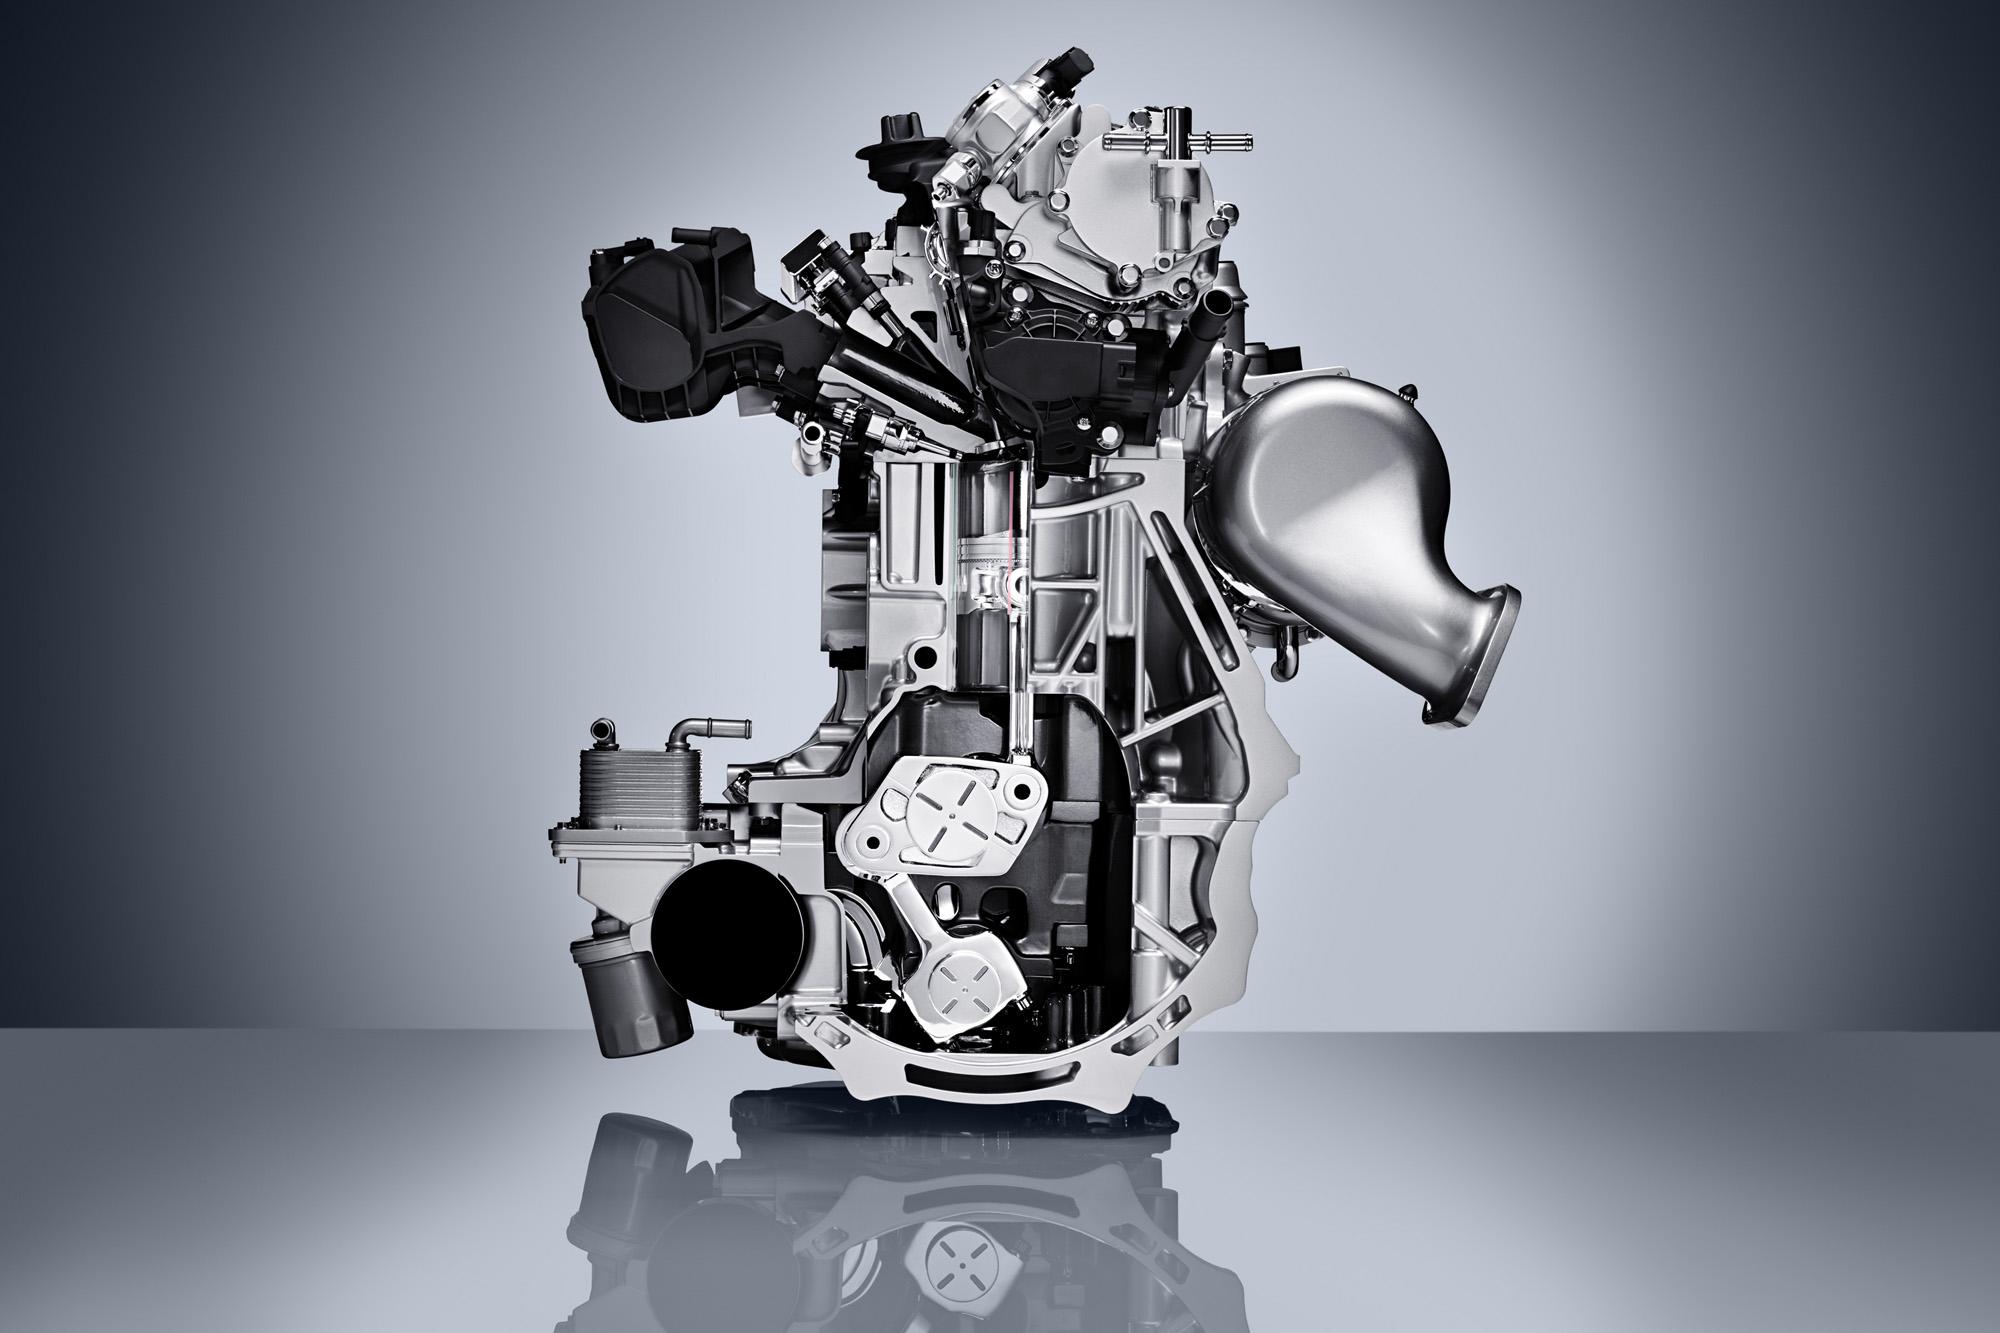 infiniti-vc-turbo-engine-1